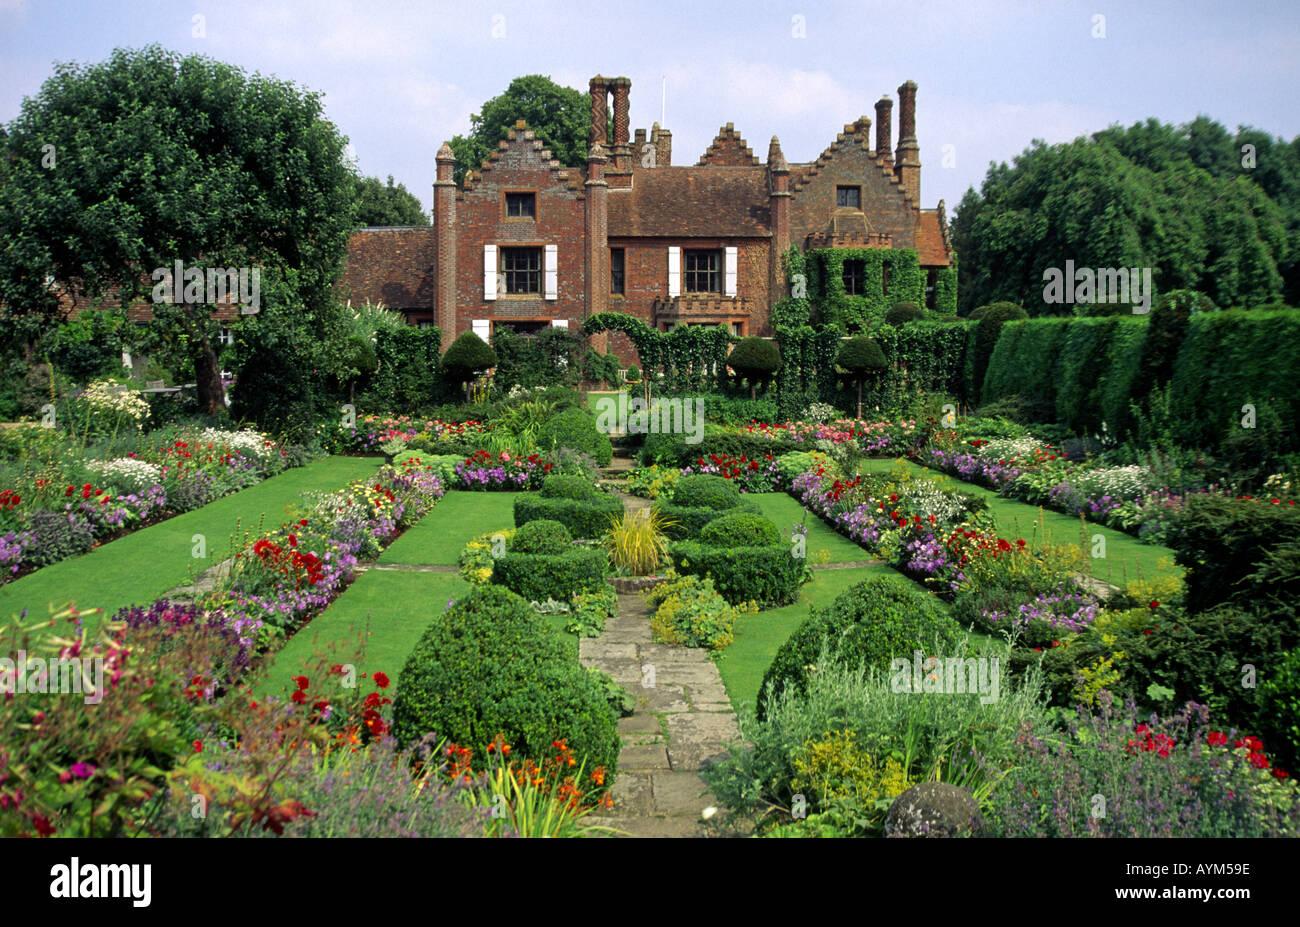 chenies manor buckinghamshire england uk stock photo, royalty free